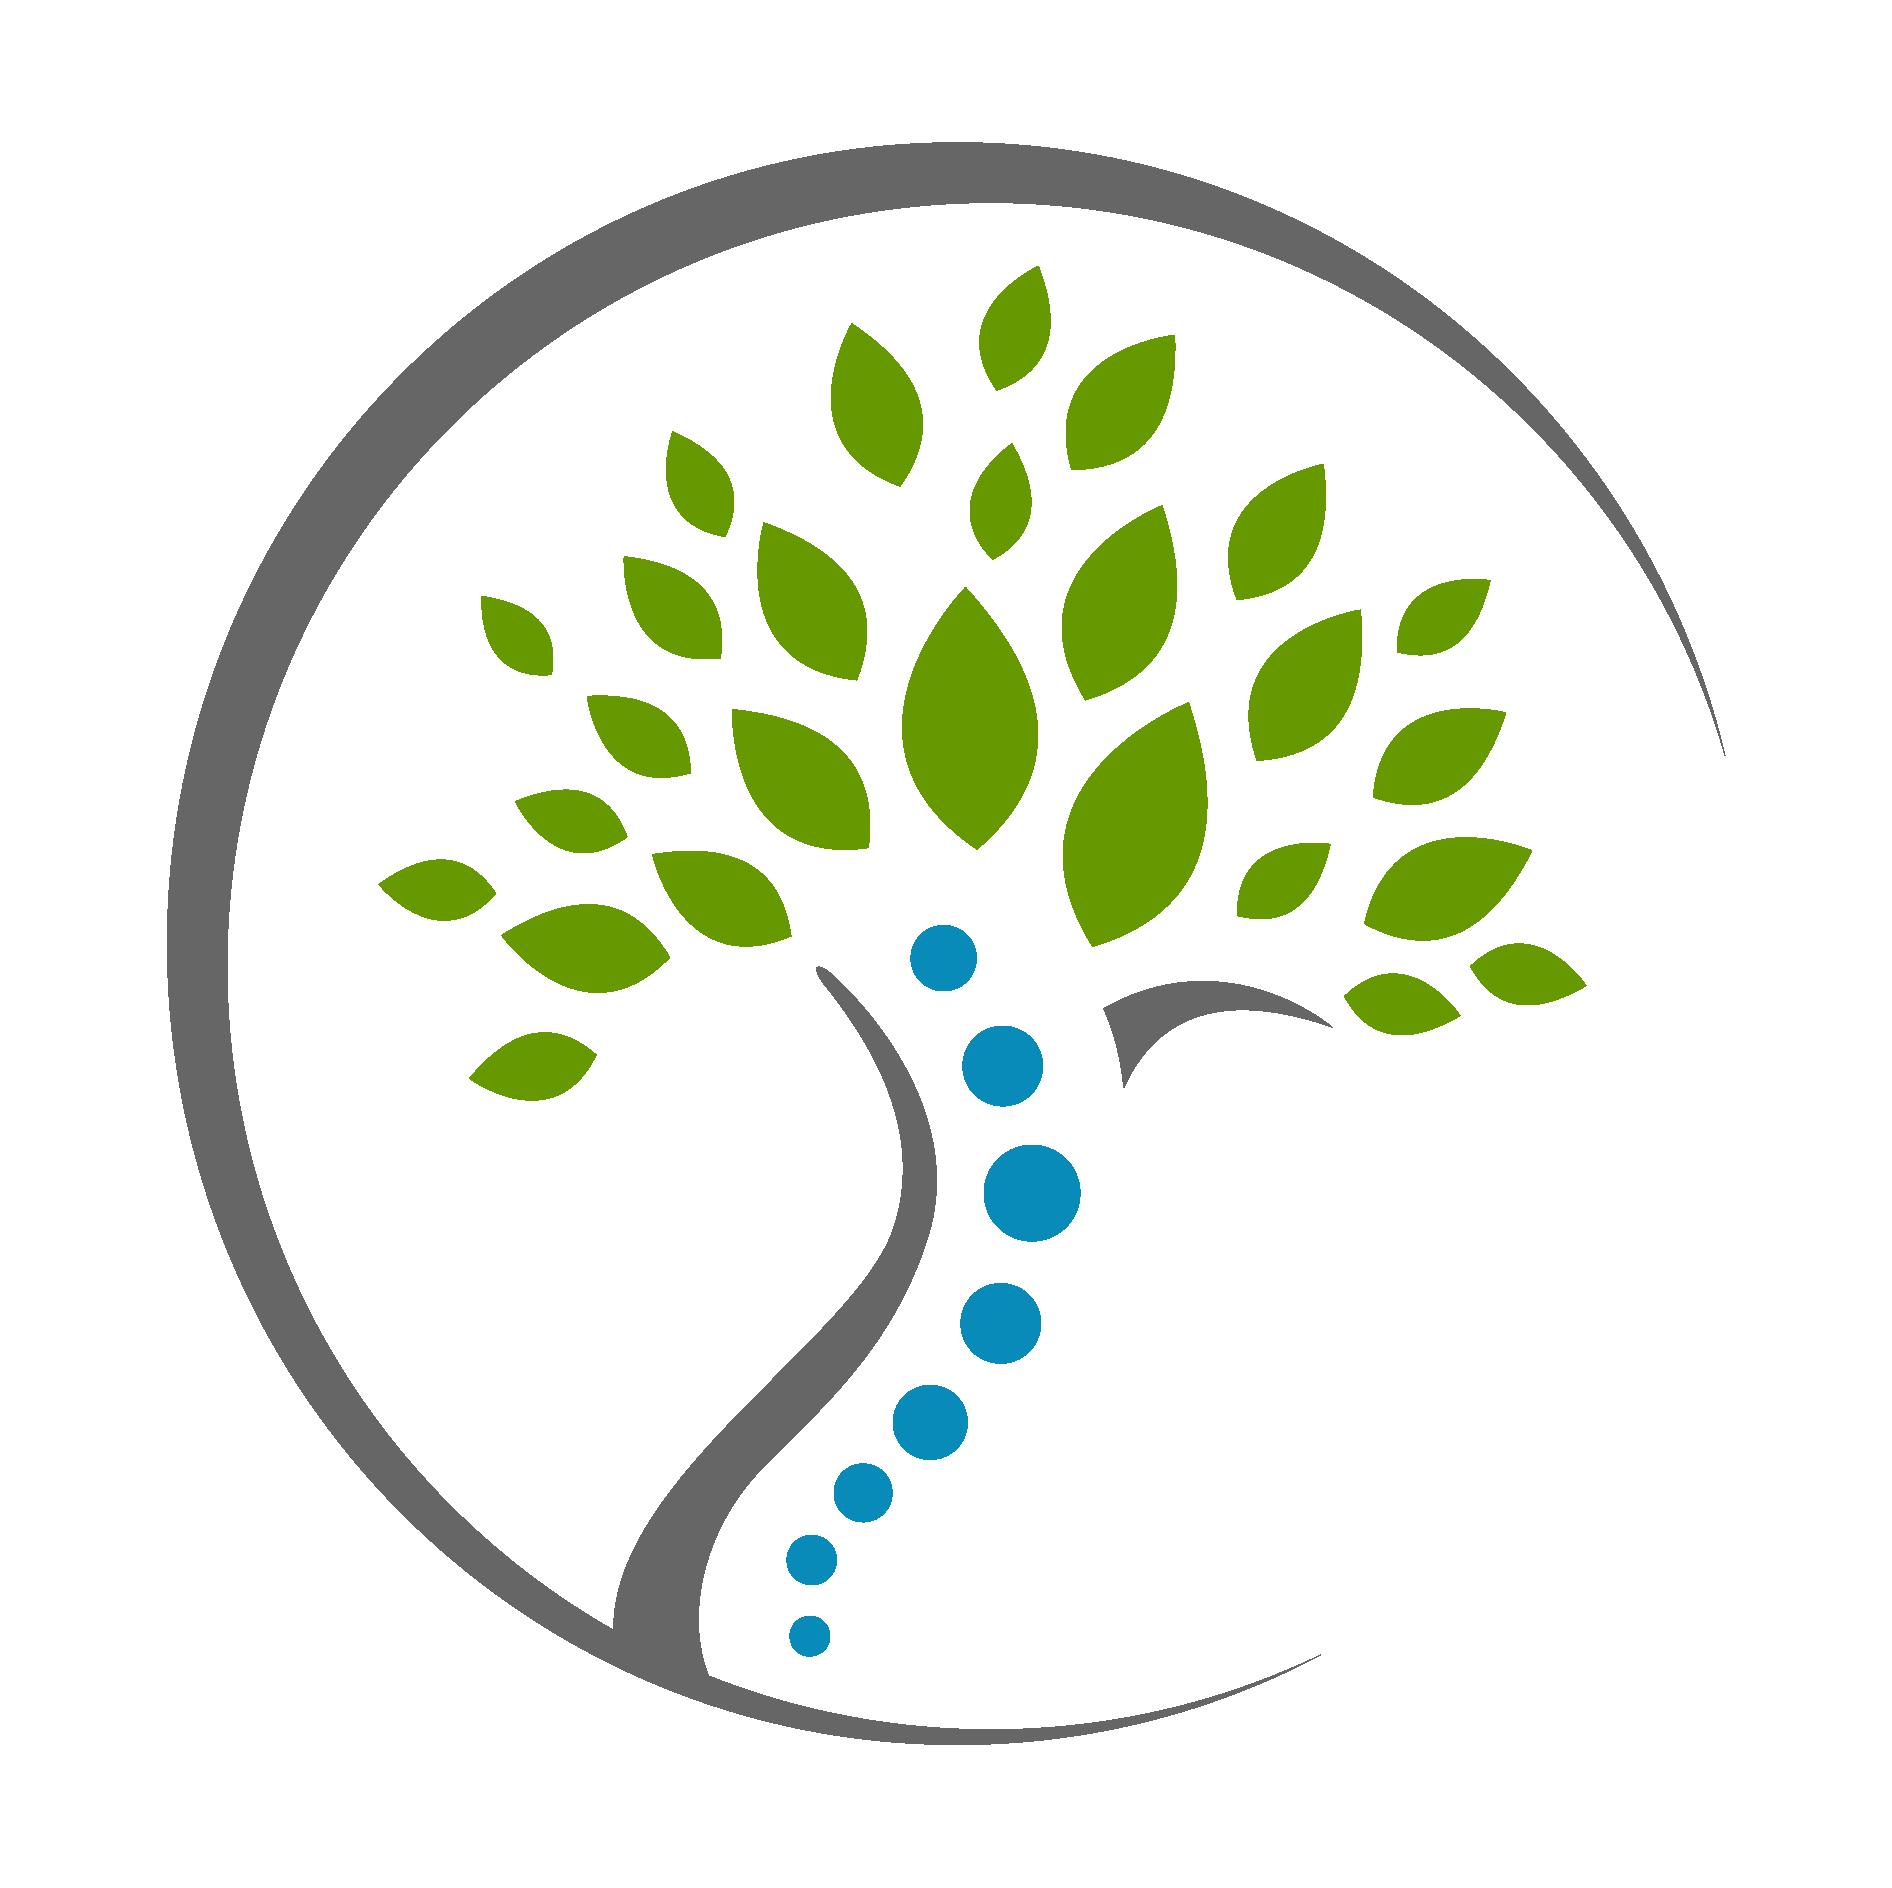 Logo von Heilpraktiker Nürnberg Bernhard Jochem